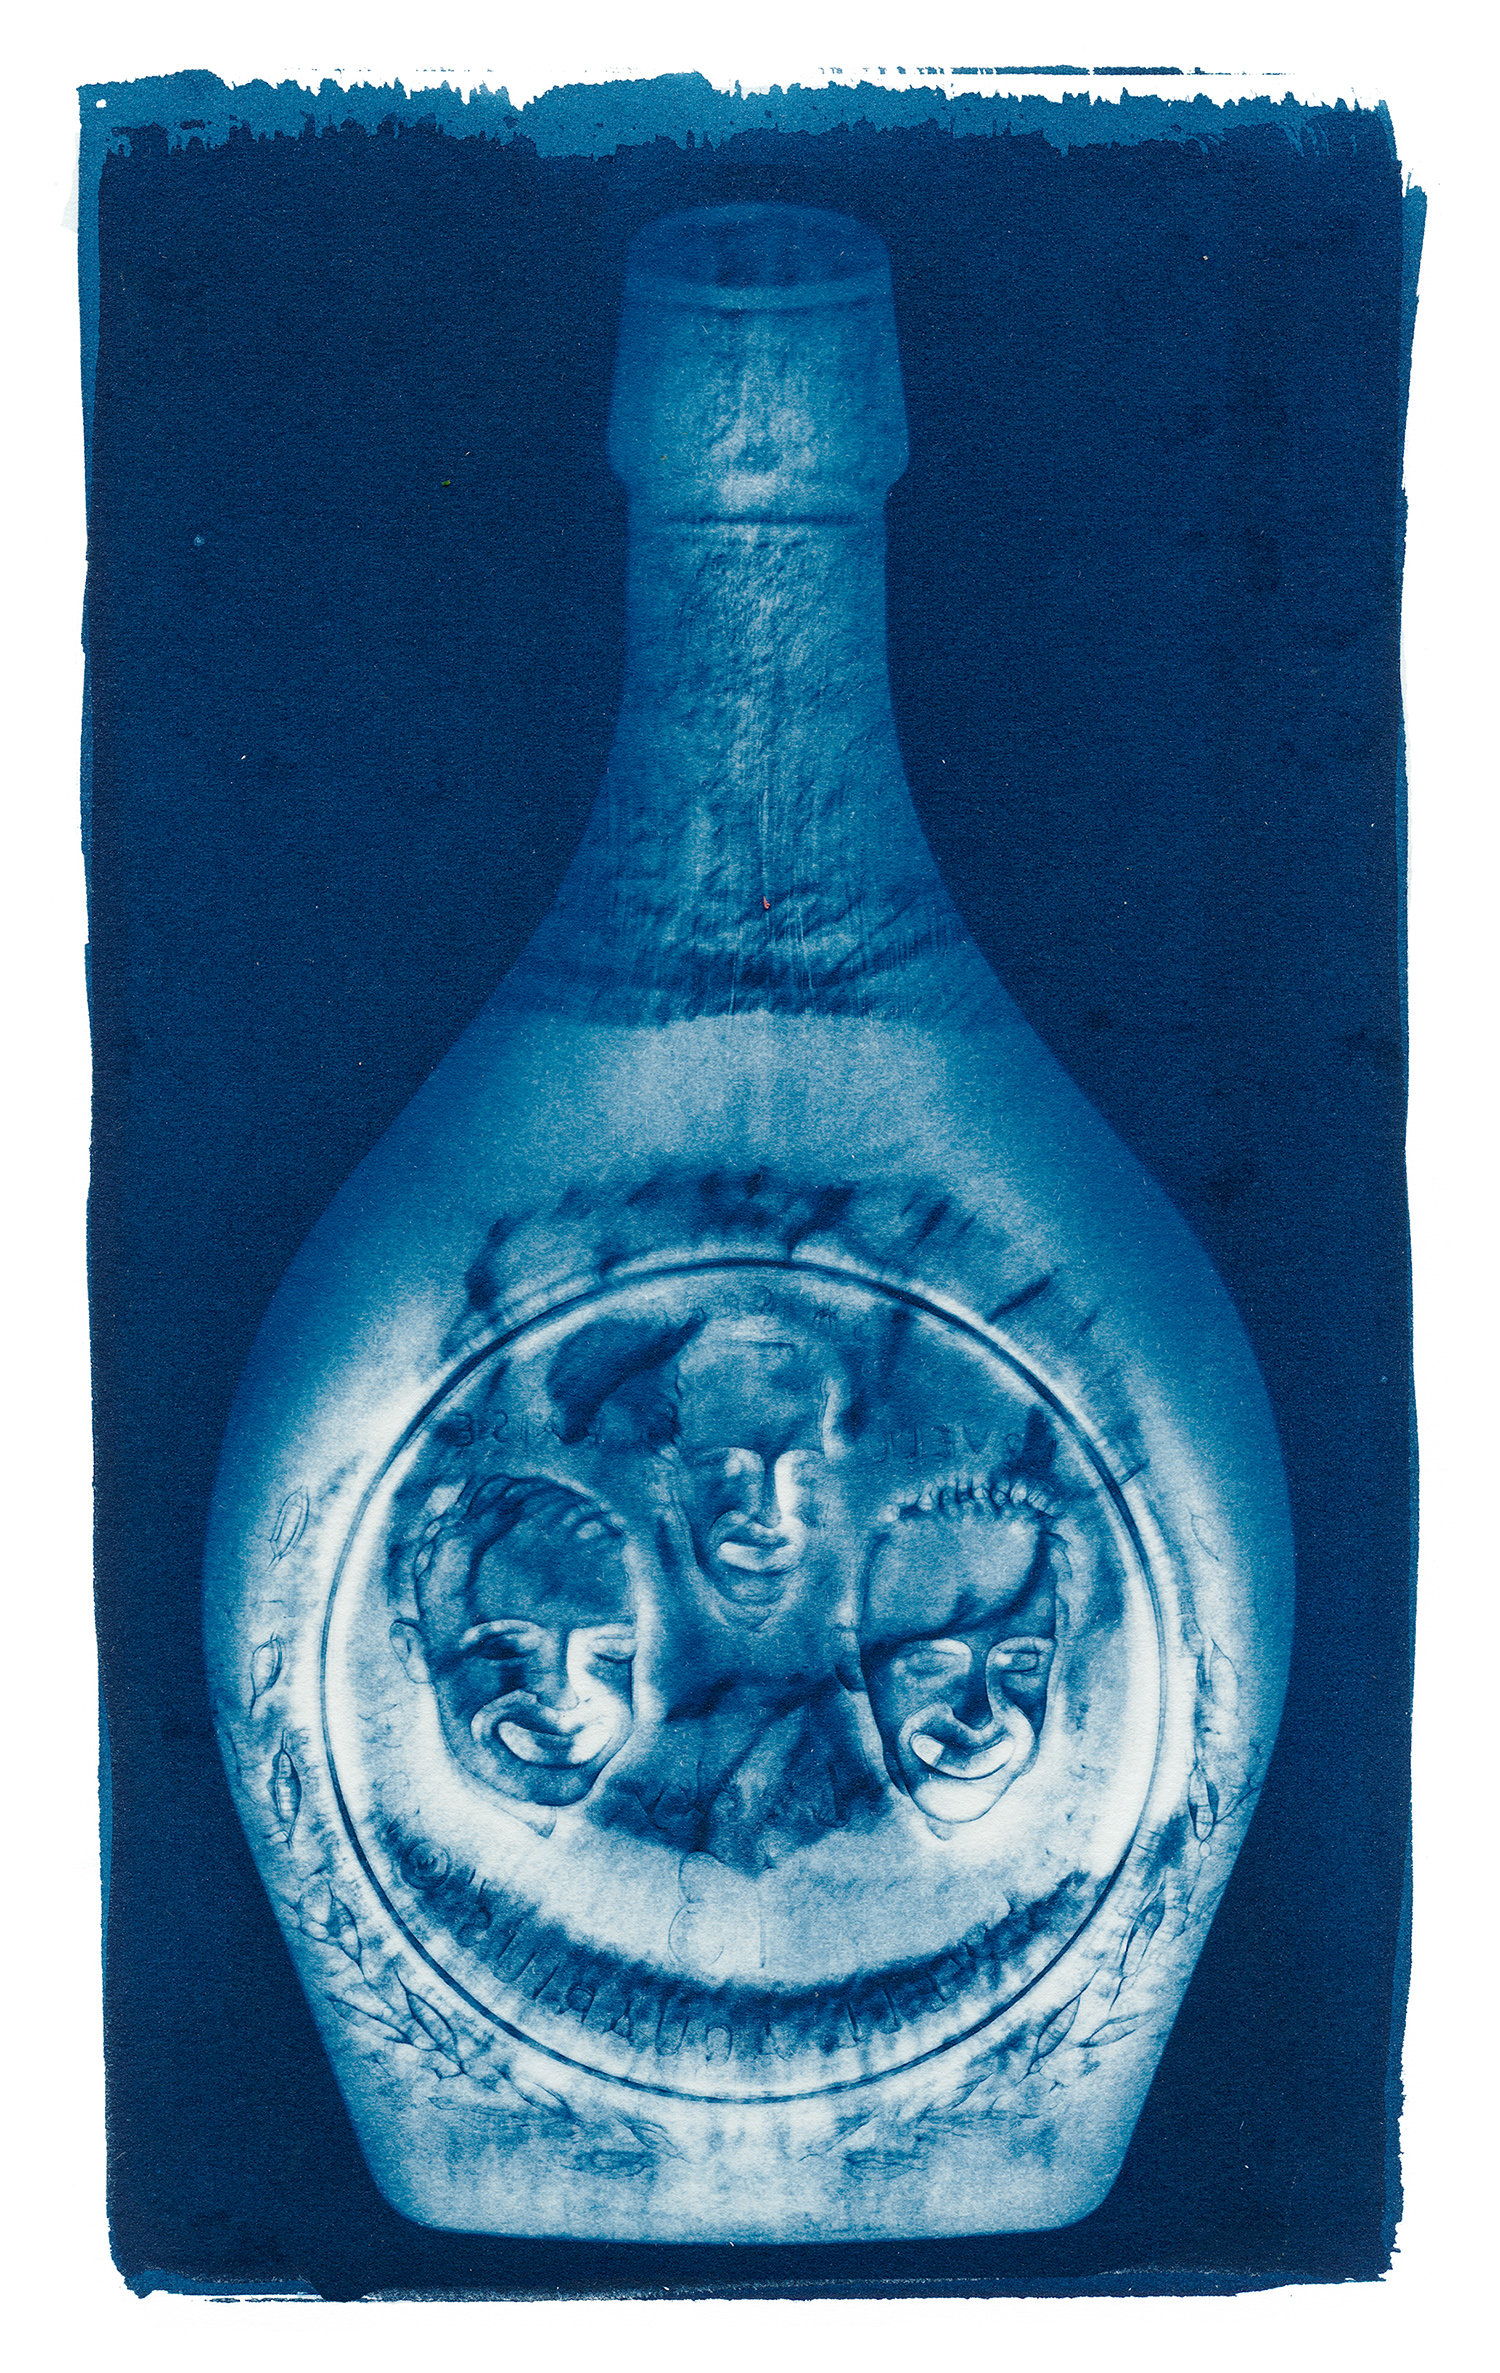 Apollo 13 Bottle (Back), 2011